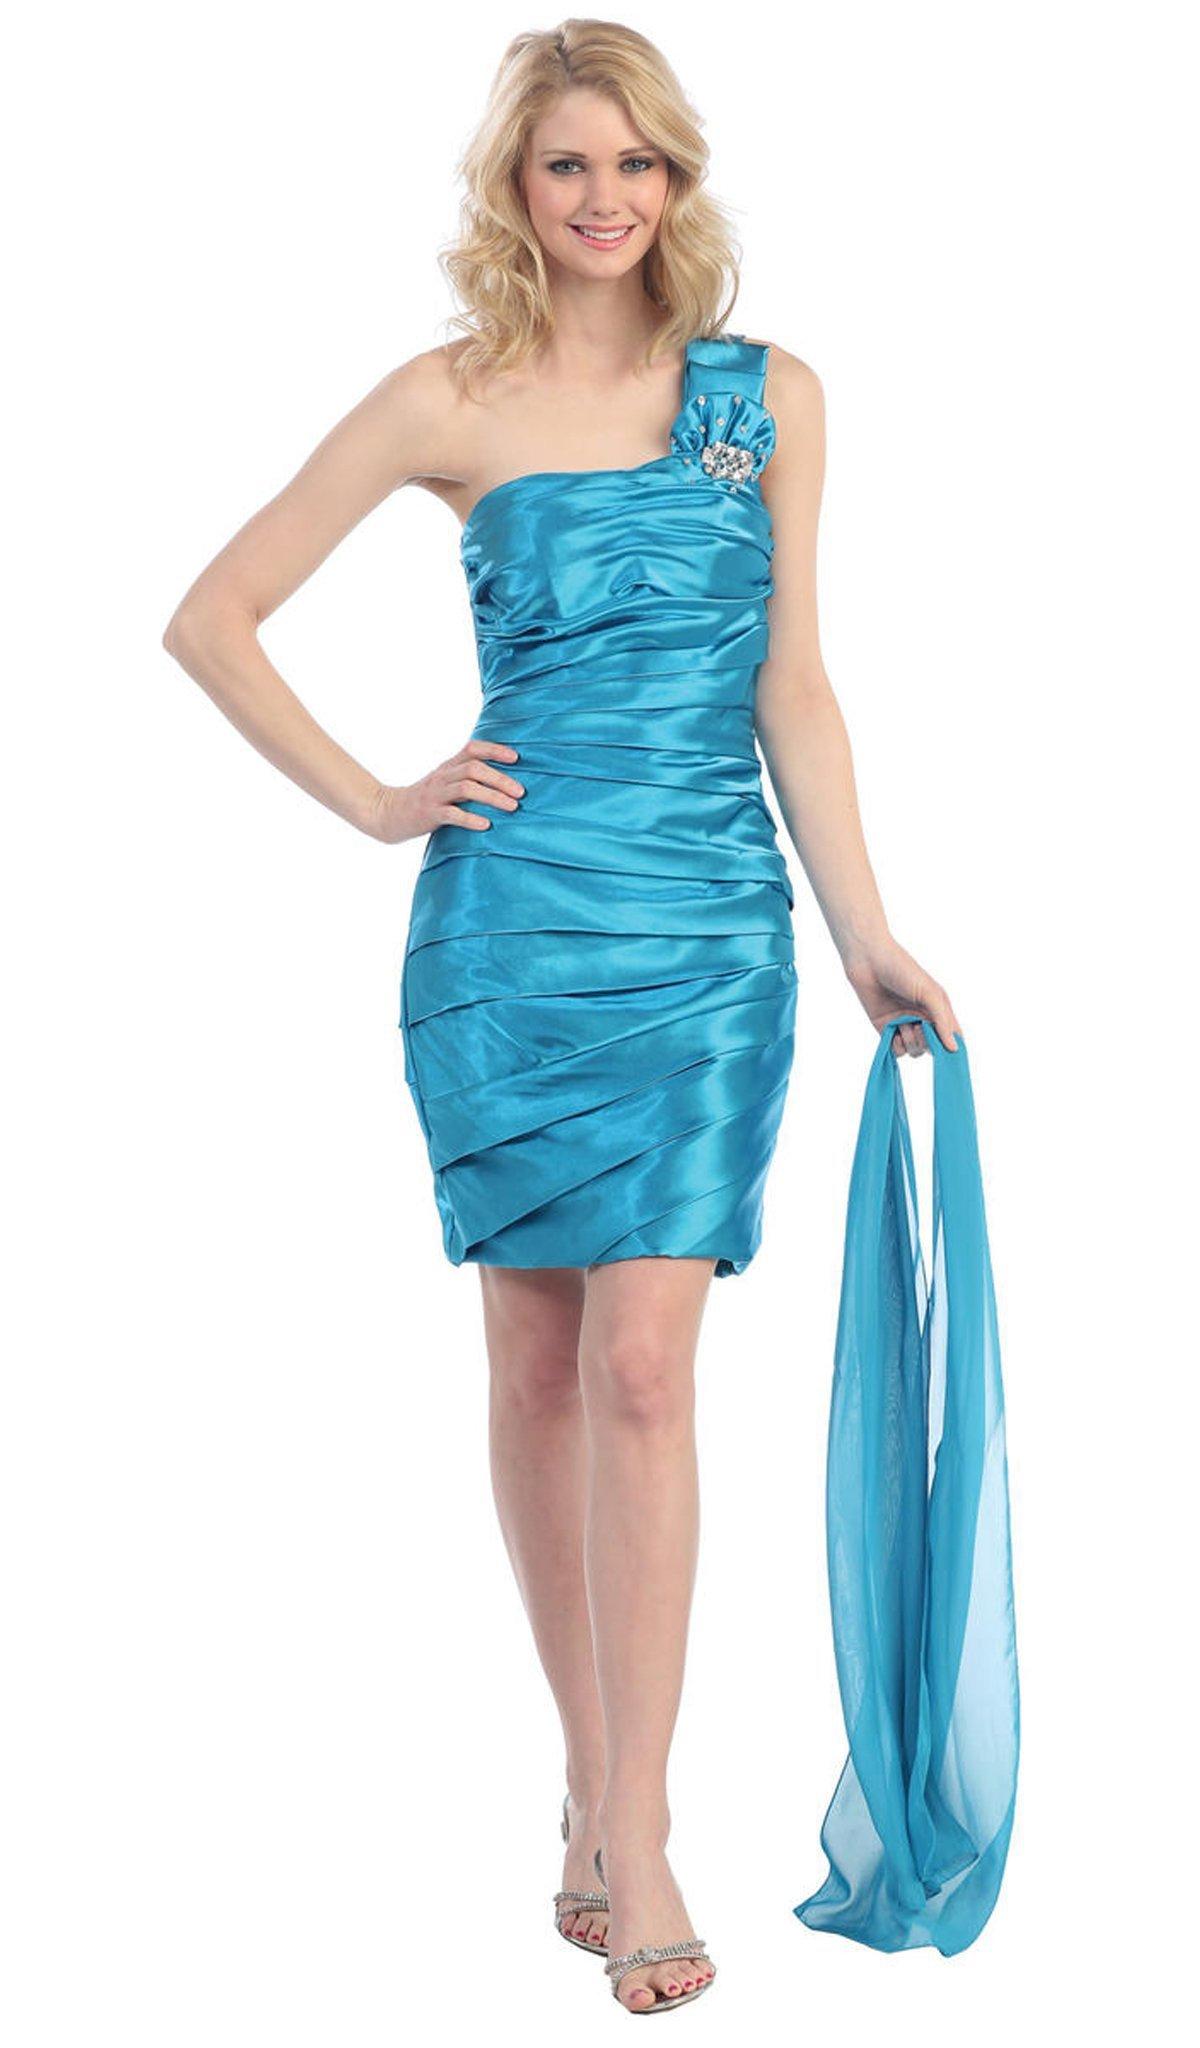 Eureka Fashion - 2280 One Shoulder Pleated Charmeuse Cocktail Dress